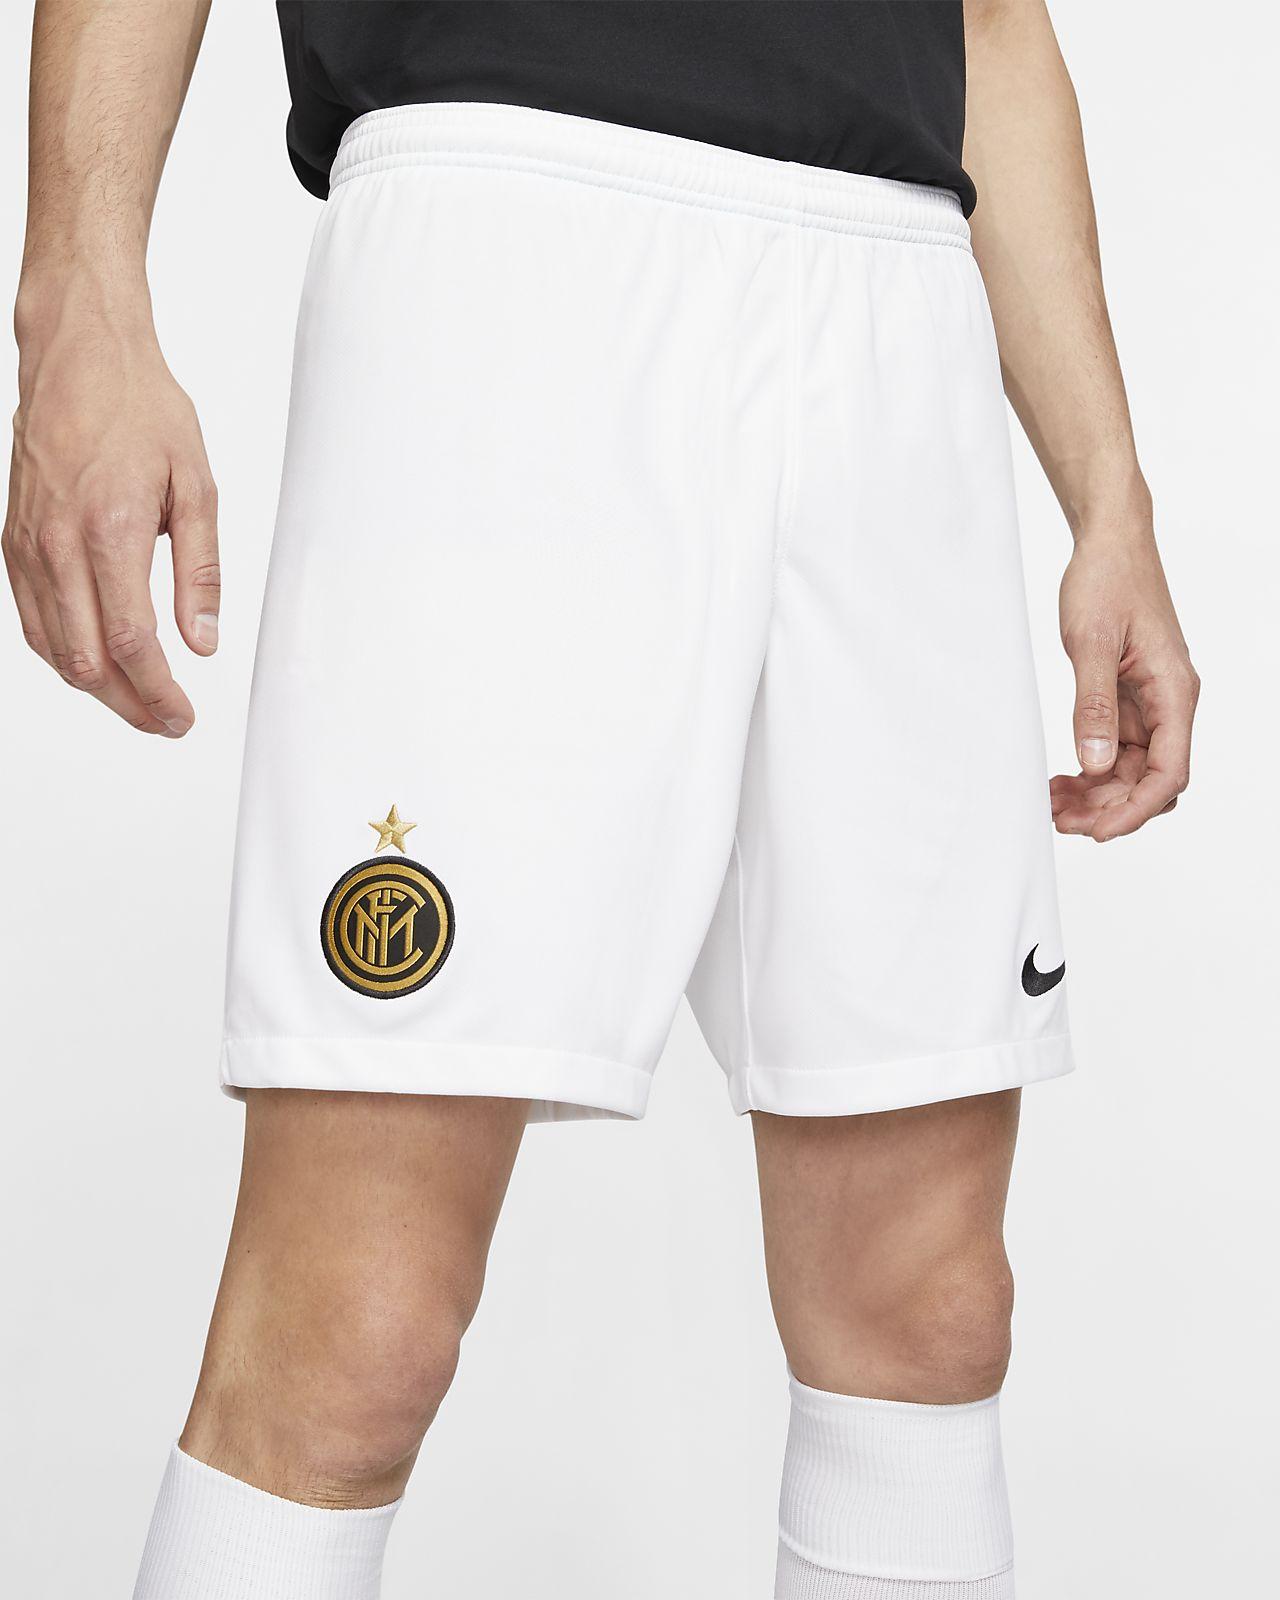 Męskie spodenki piłkarskie Inter Milan 2019/20 Stadium Home/Away